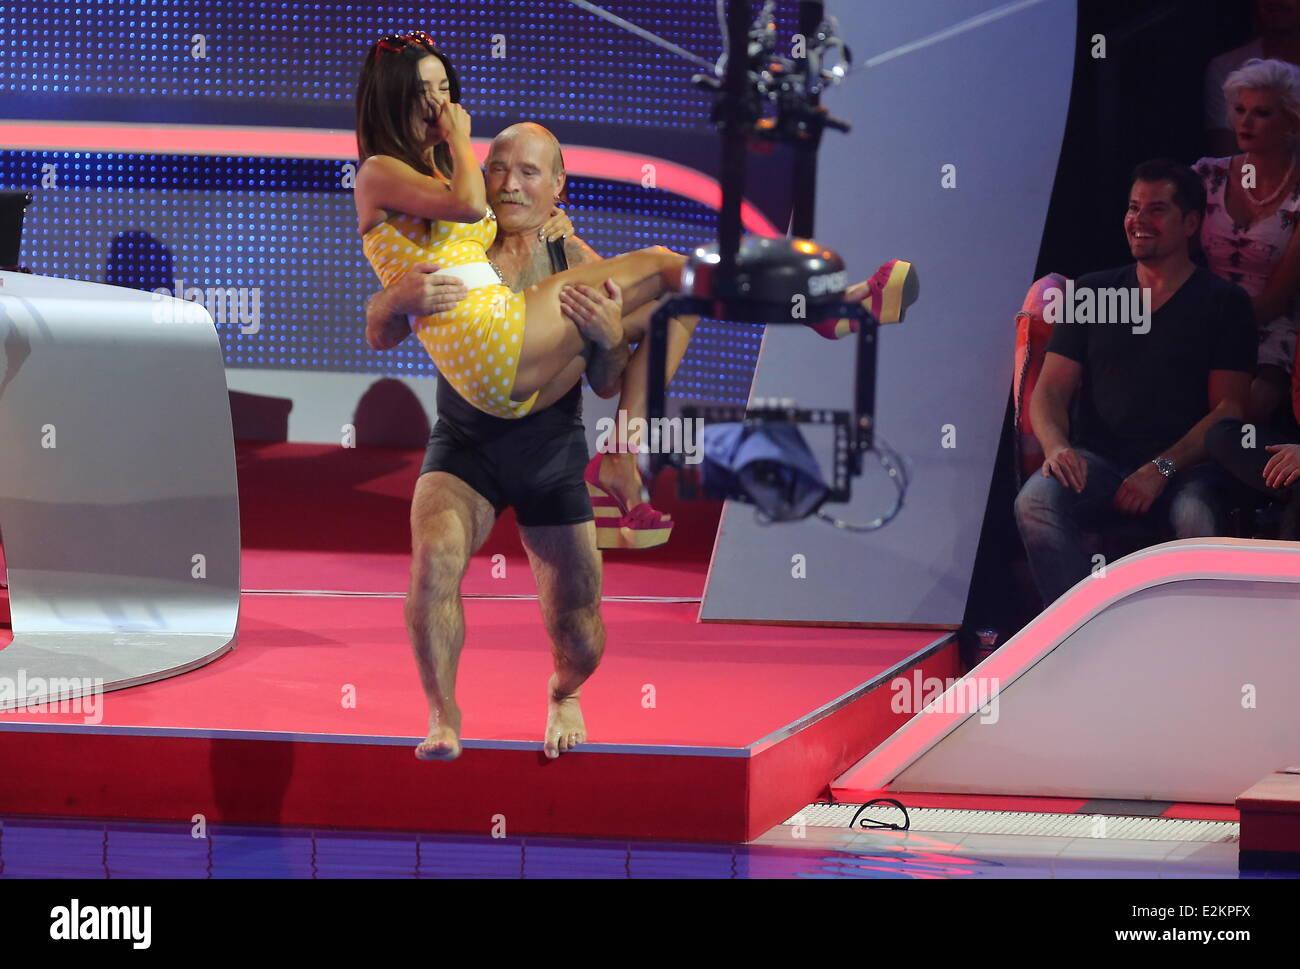 Konny reimann verona pooth on german rtl tv show 39 die for Pool show 5168